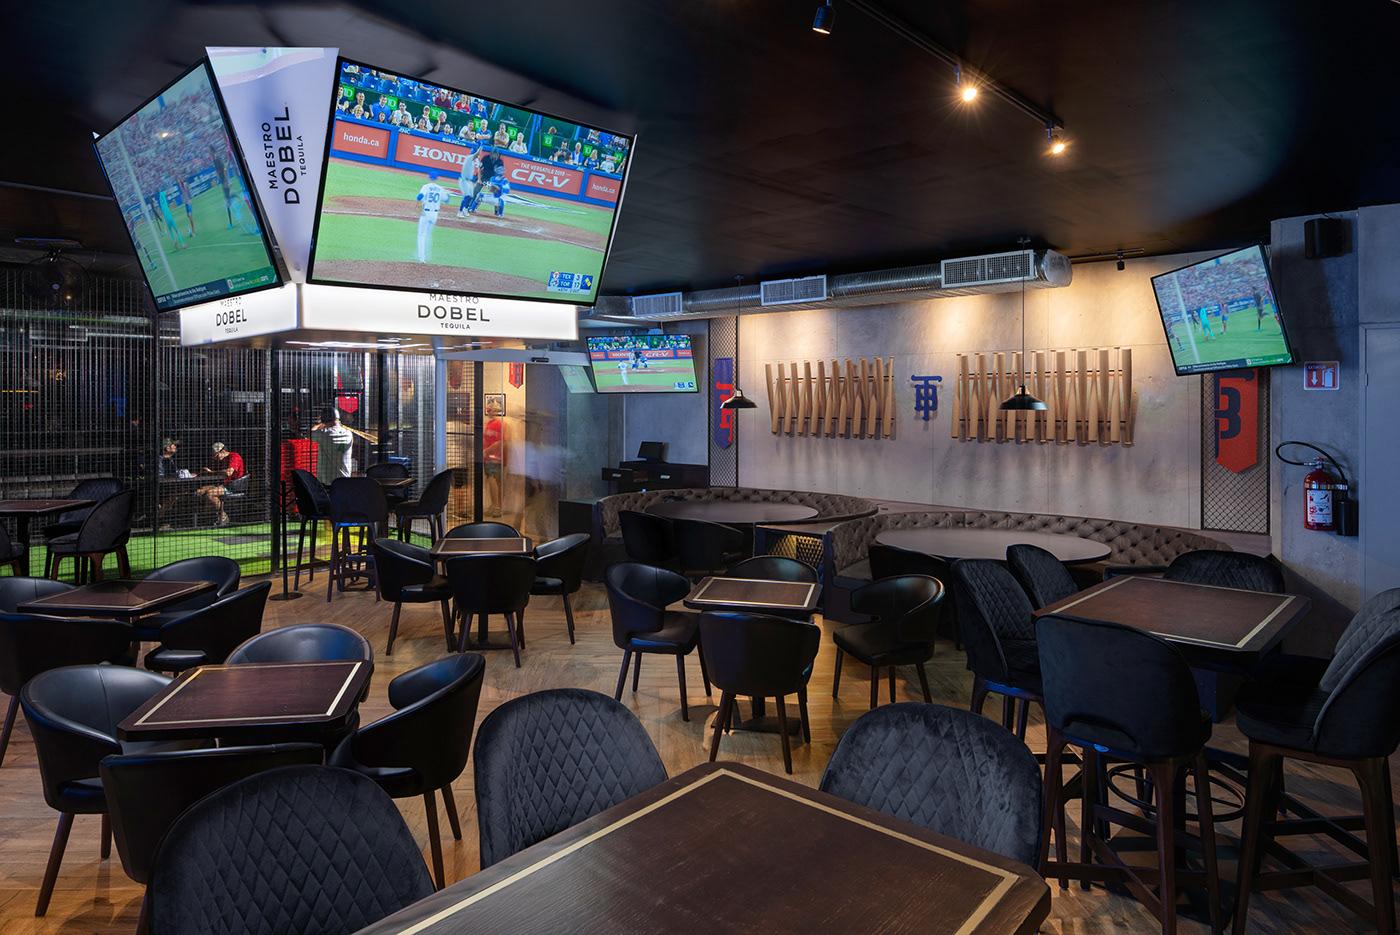 baseball,bar,restaurant,simulator,Isometric,sports,Sportsbar,monogram,logo,colorful